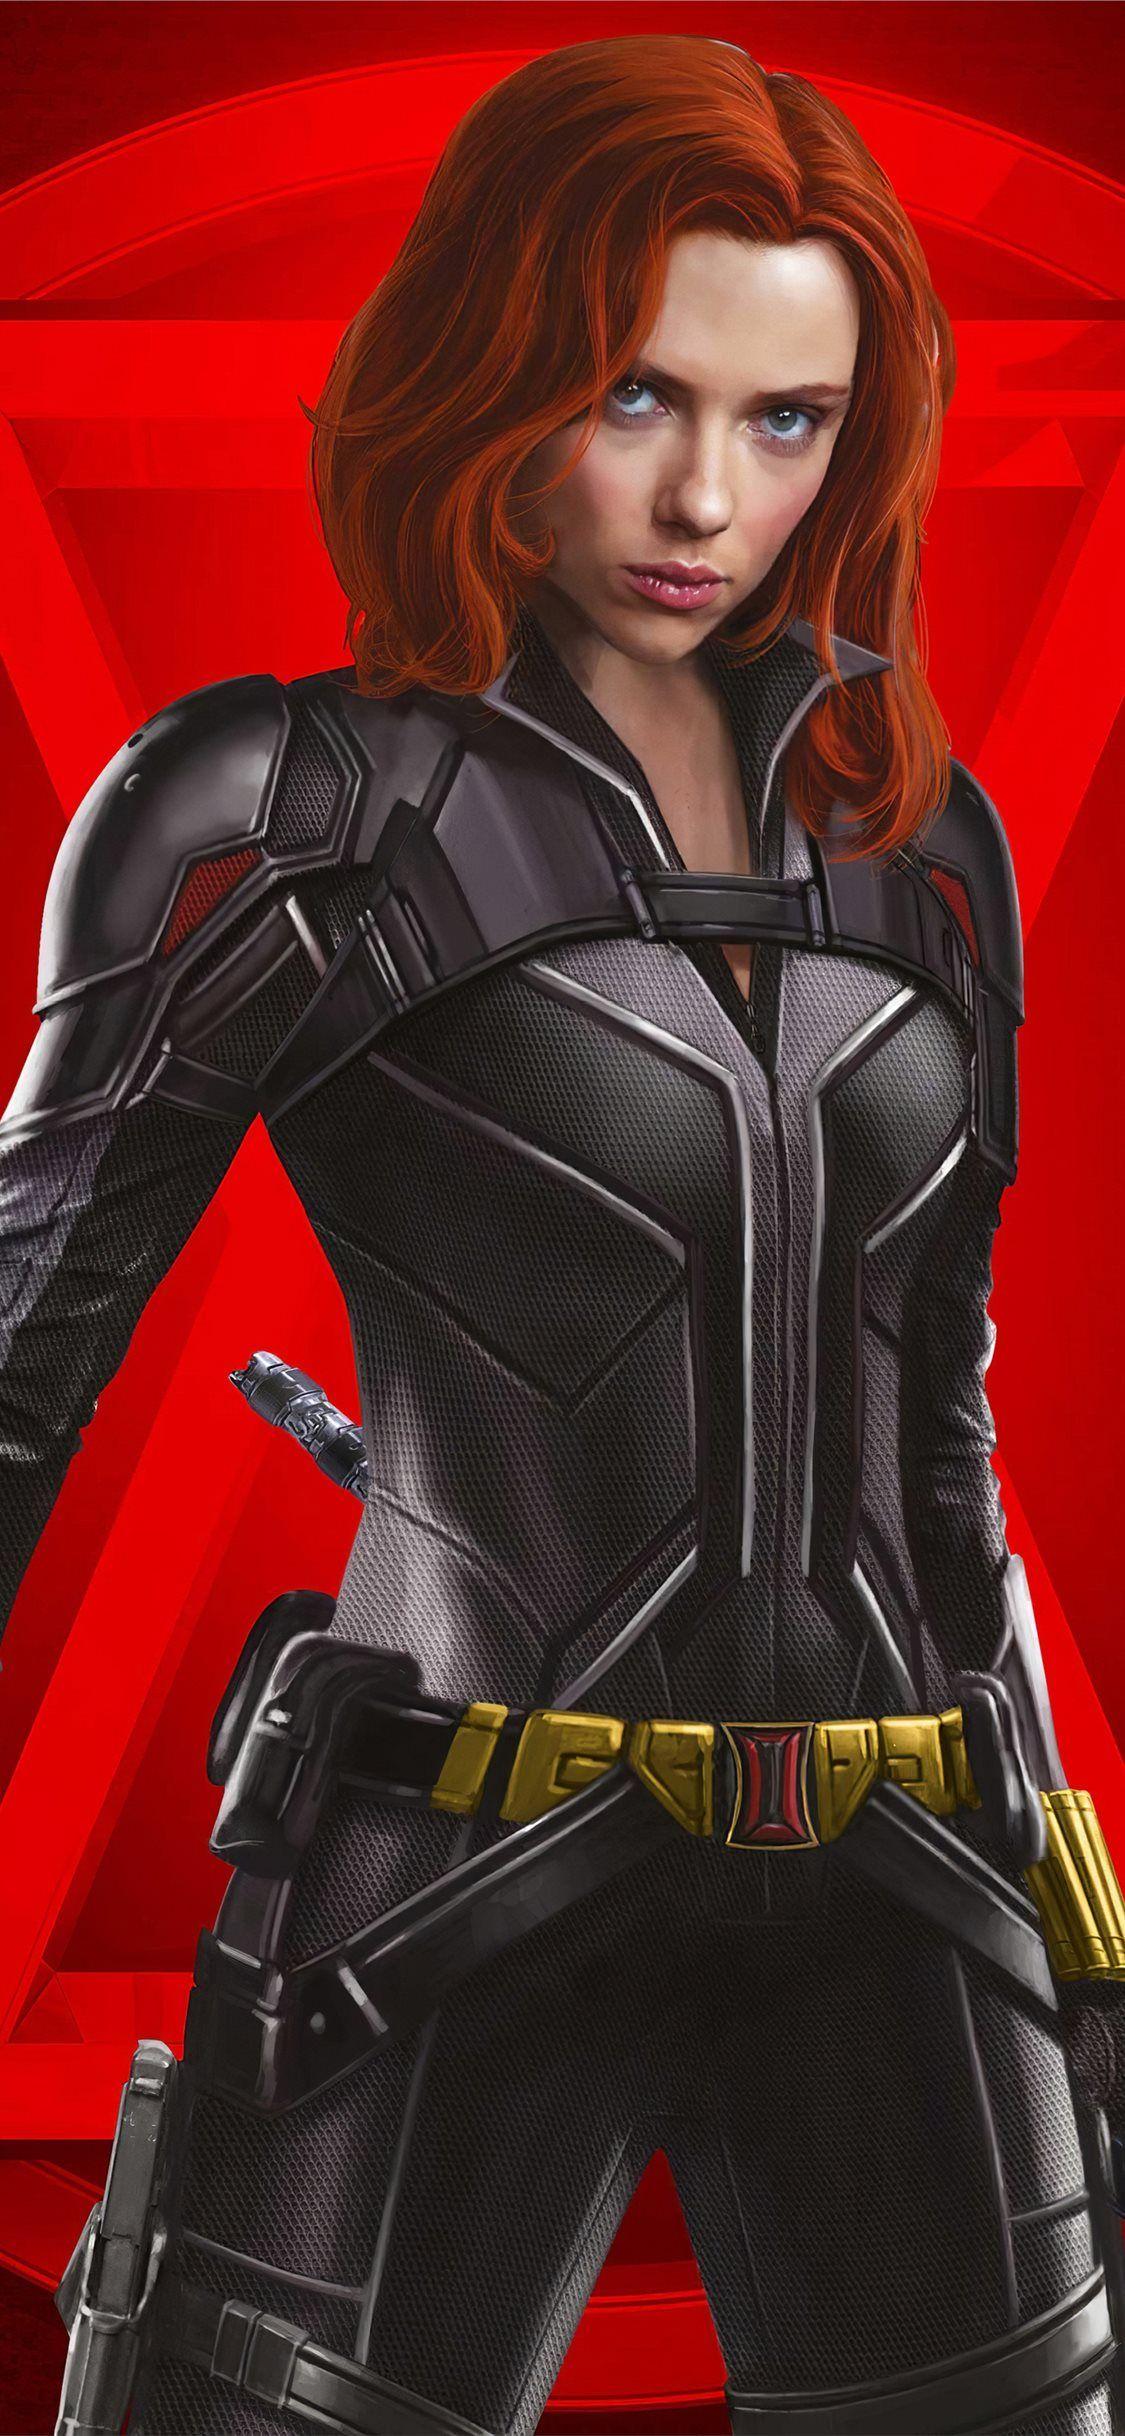 Black Widow 4k Poster 2020 Blackwidow Movies 2020movies 4k Marvel Iphonexwallpaper Black Widow Movie Black Widow Marvel Black Widow Wallpaper